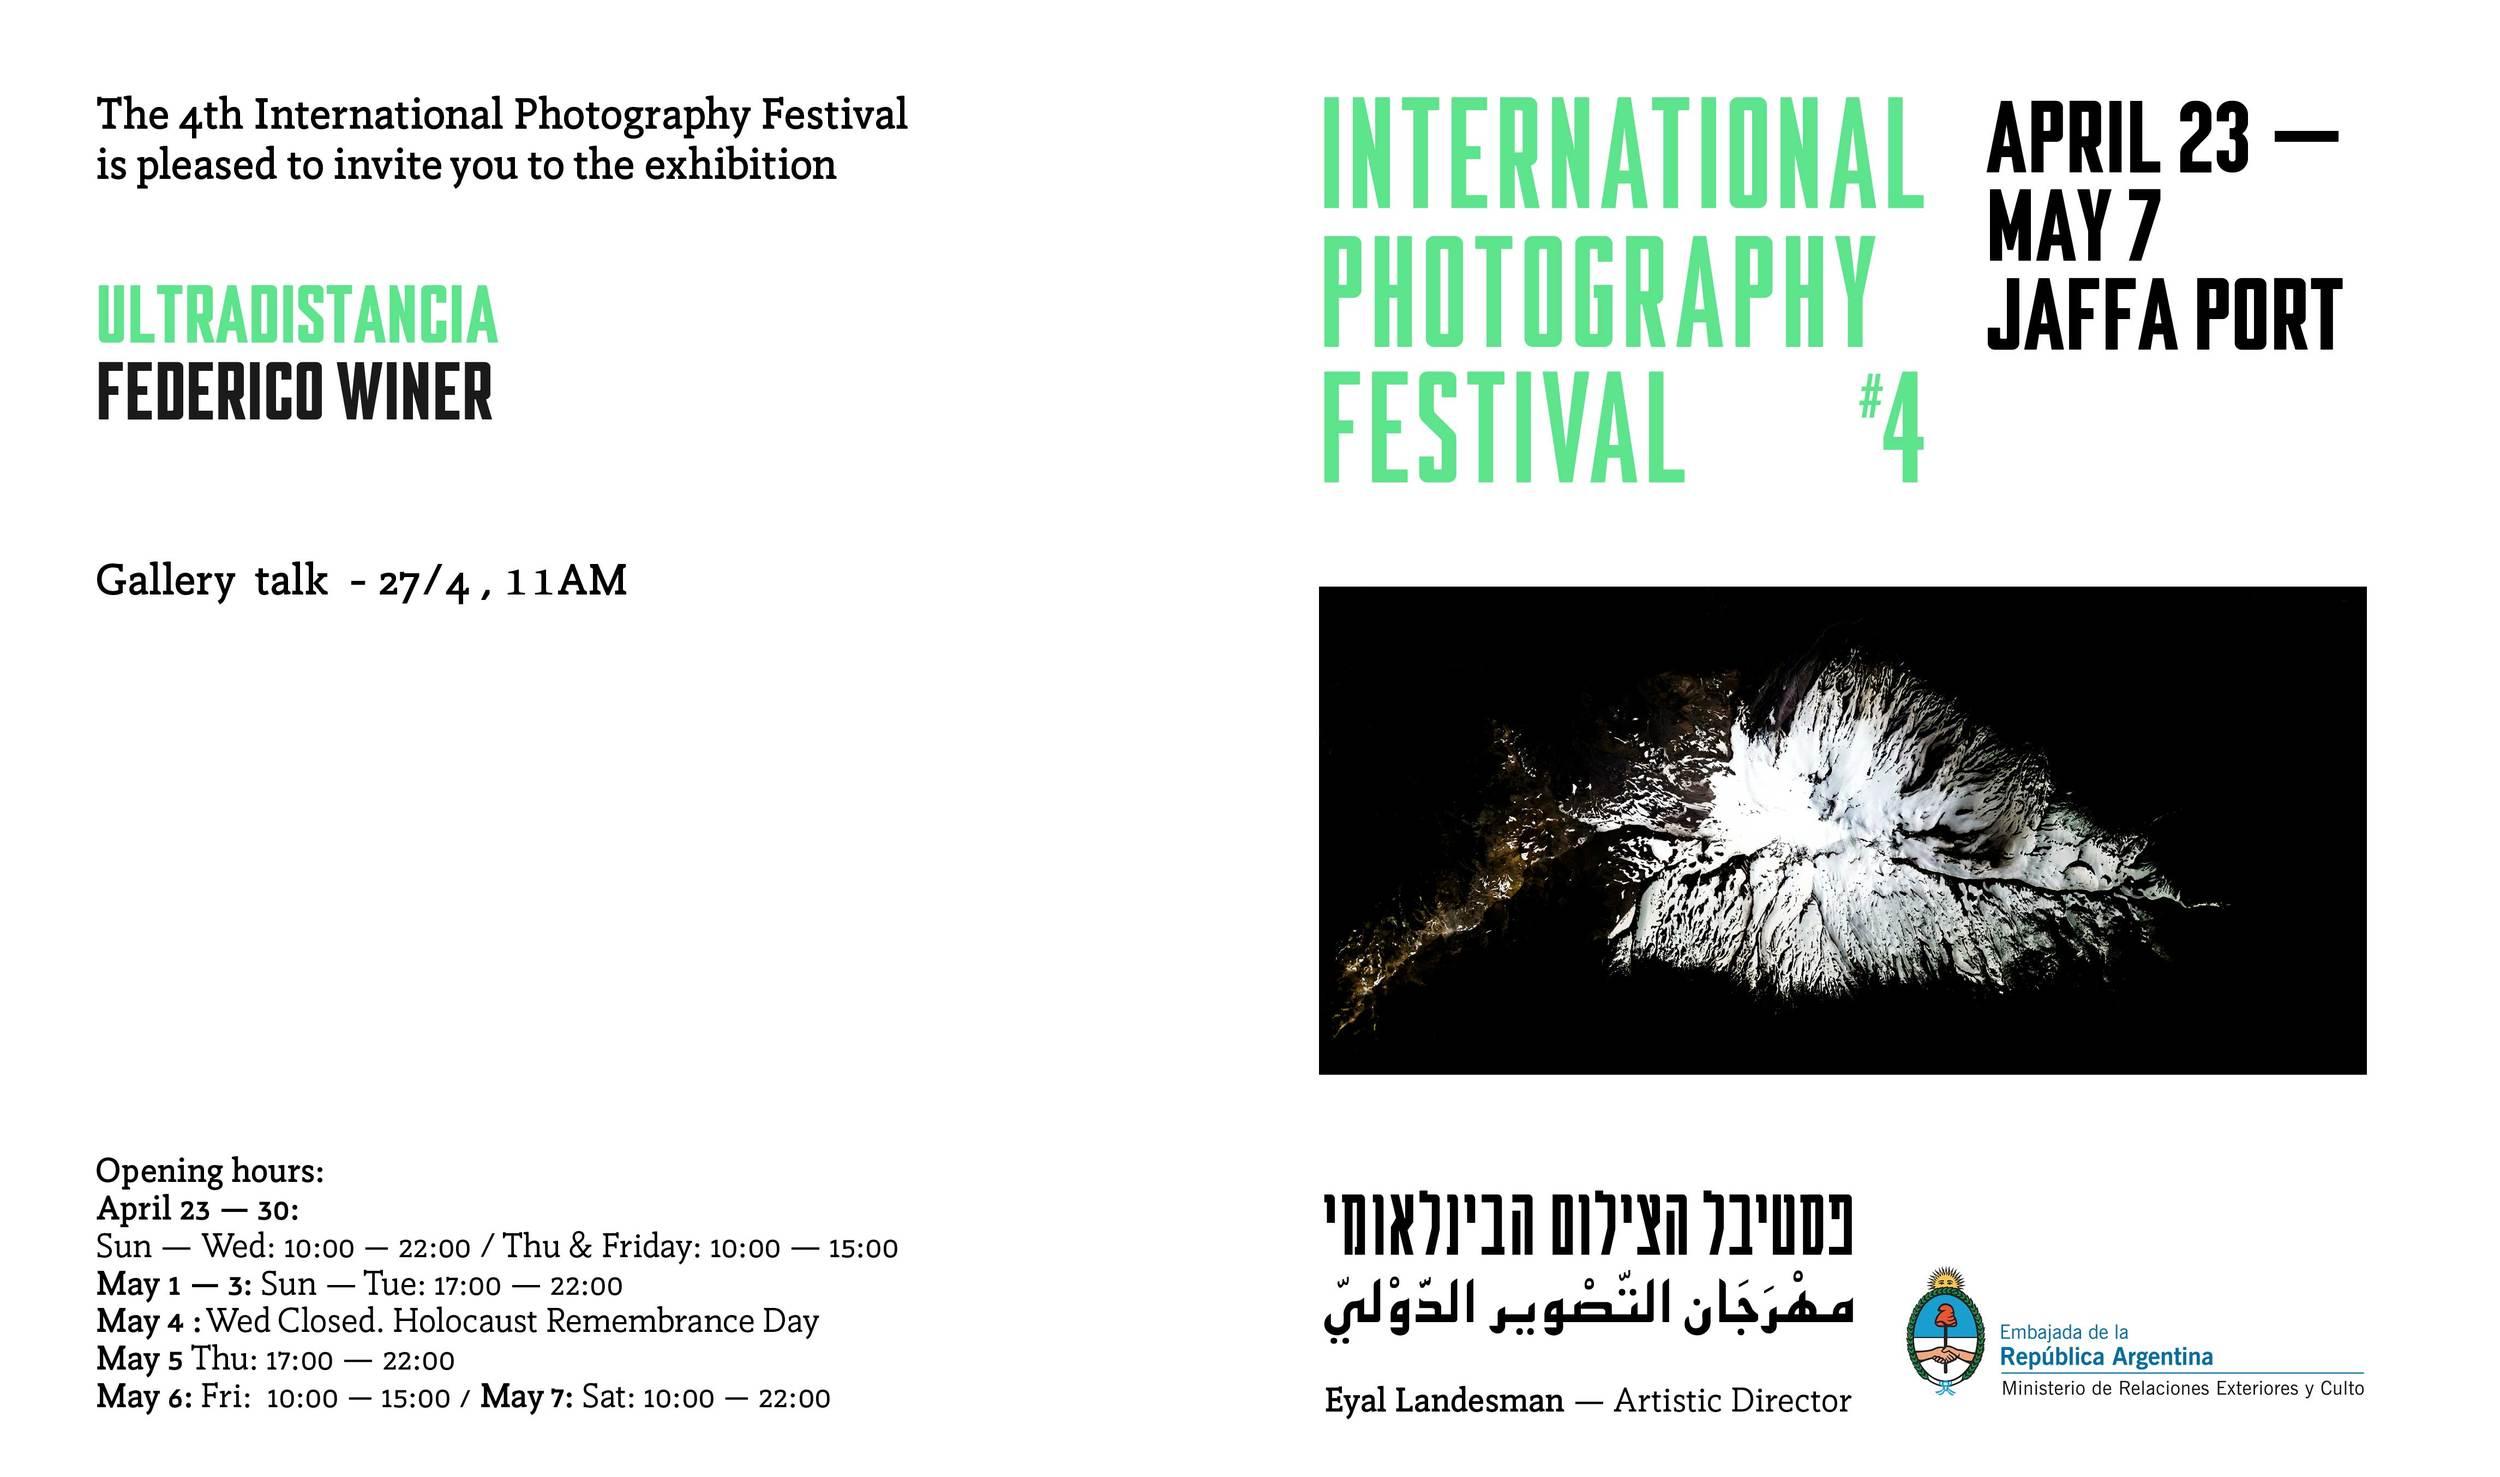 International Photography Festival Tel Aviv 2016, Federico Winer's Ultradistancia Gallery Talk invitation card